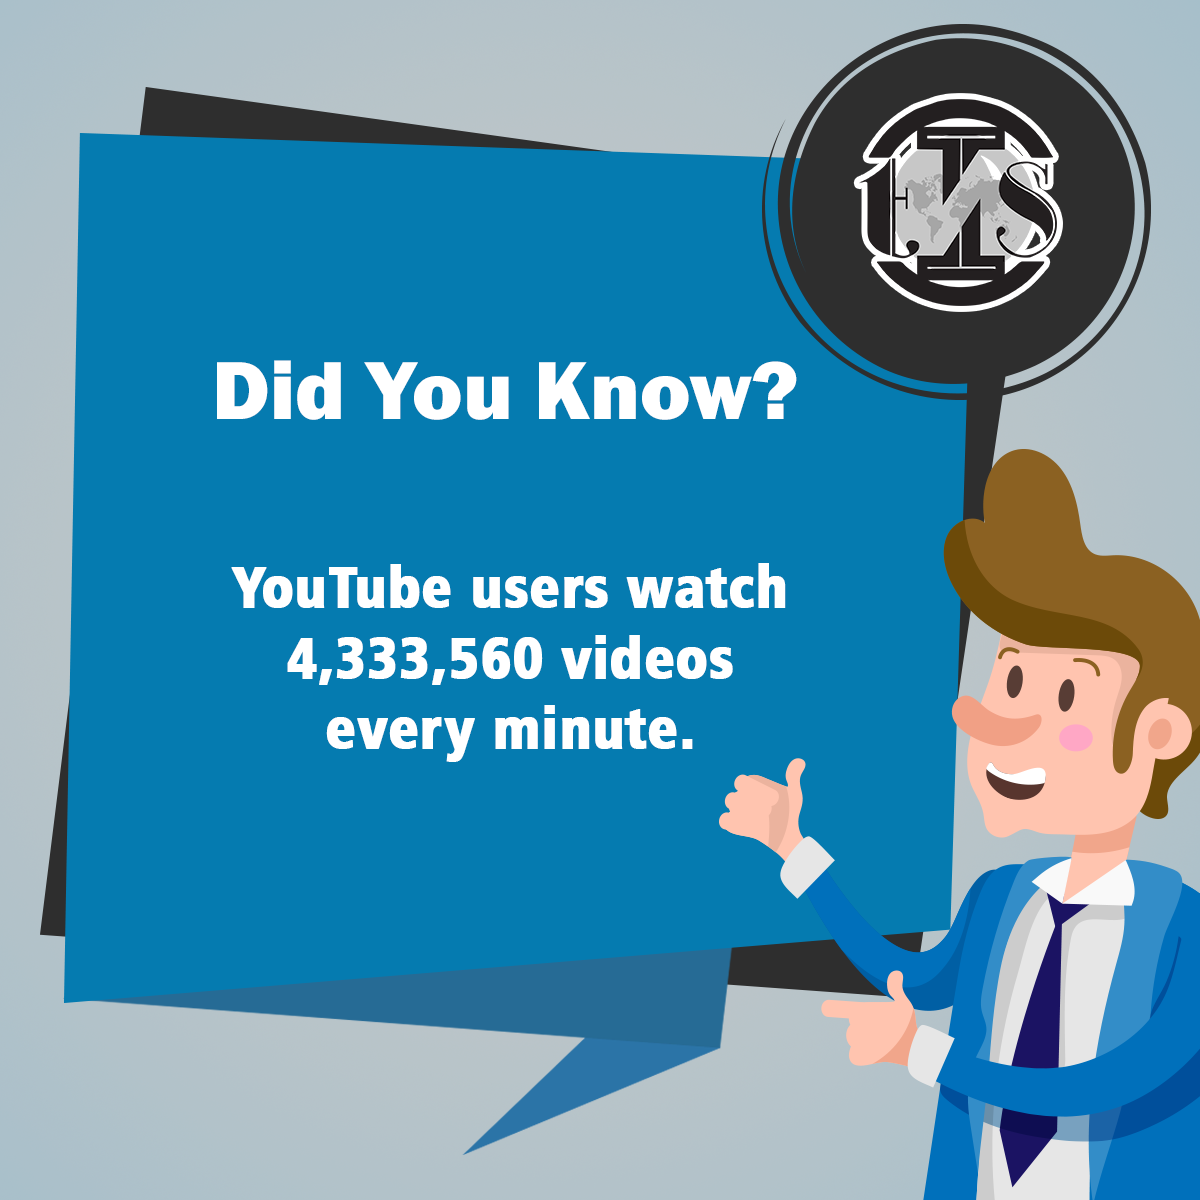 Youtube Did You Know Digital Marketing Company Digital Marketing Search Engine Optimization Services